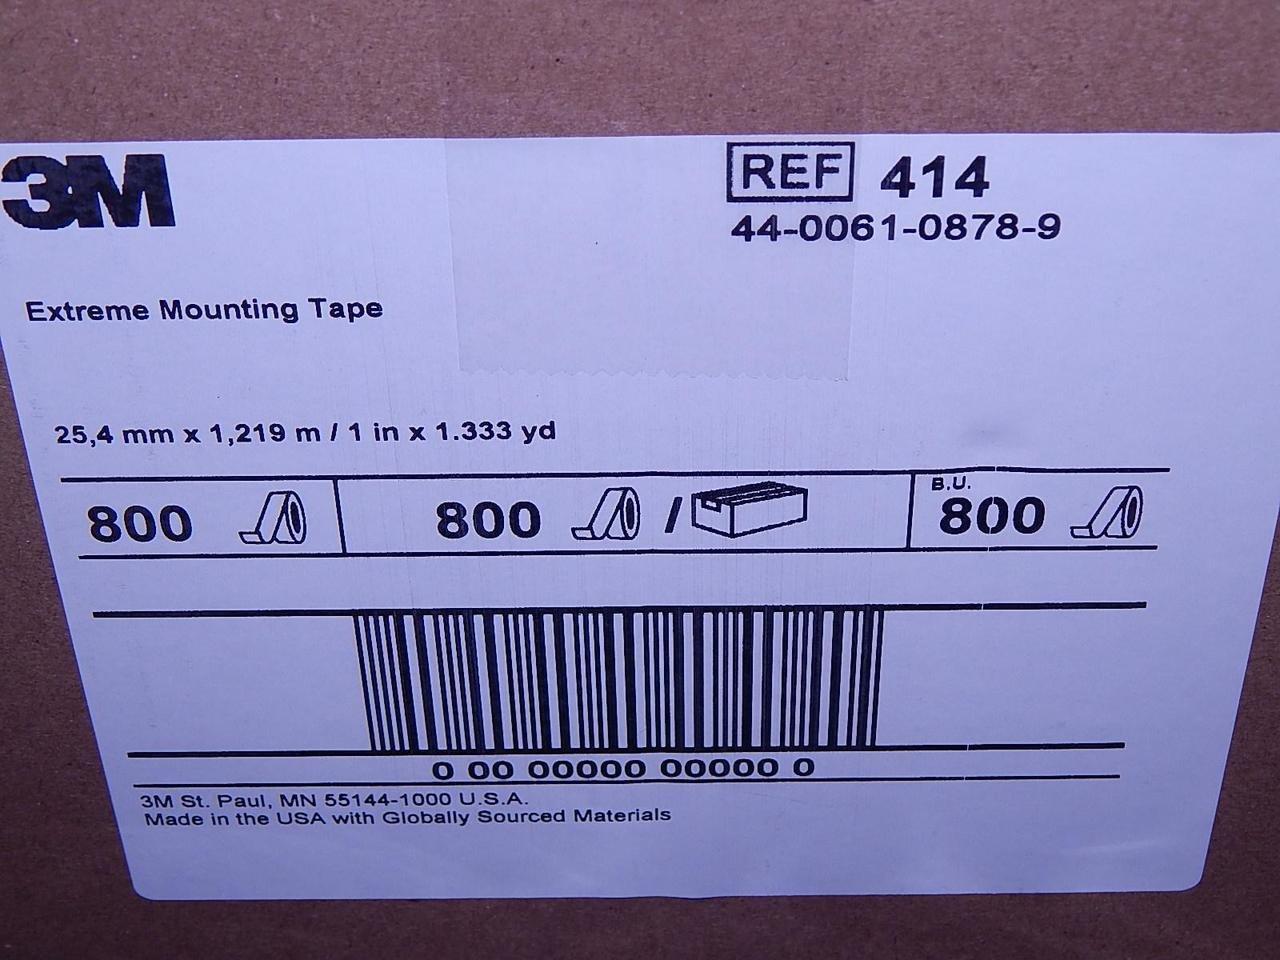 Scotch Extreme Mounting Tape 1''x60'' (30 lbs) by Scotch (Image #1)